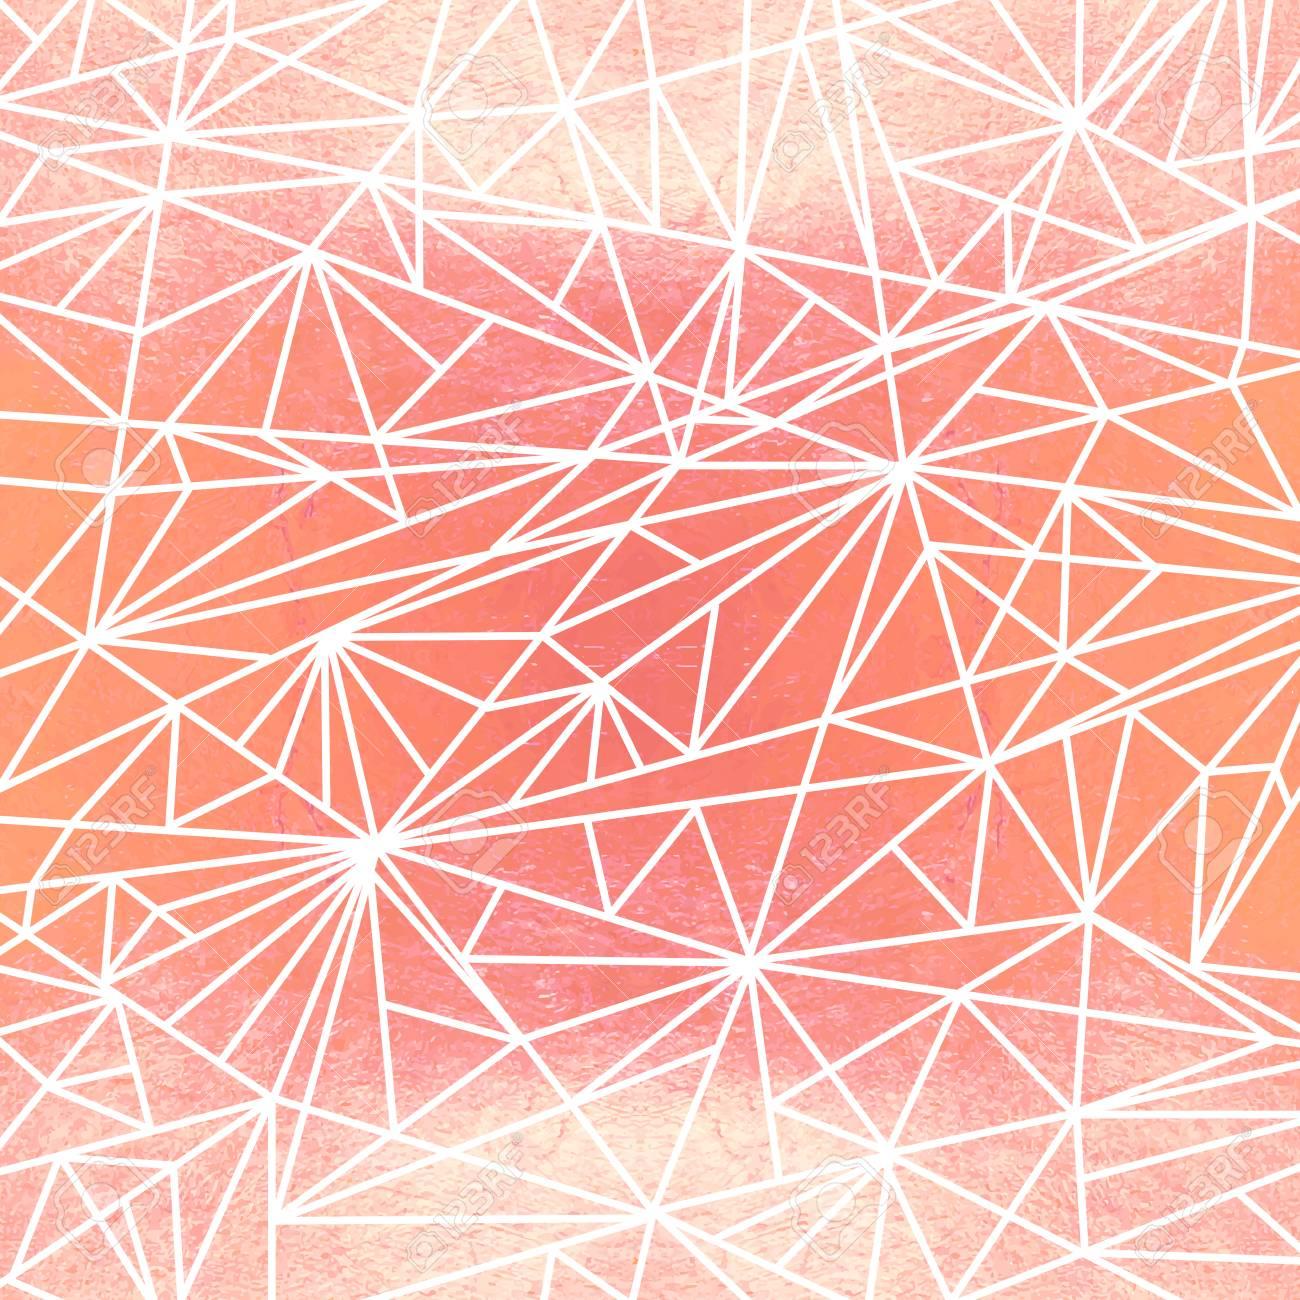 Rose Gold Pattern Interesting Design Inspiration